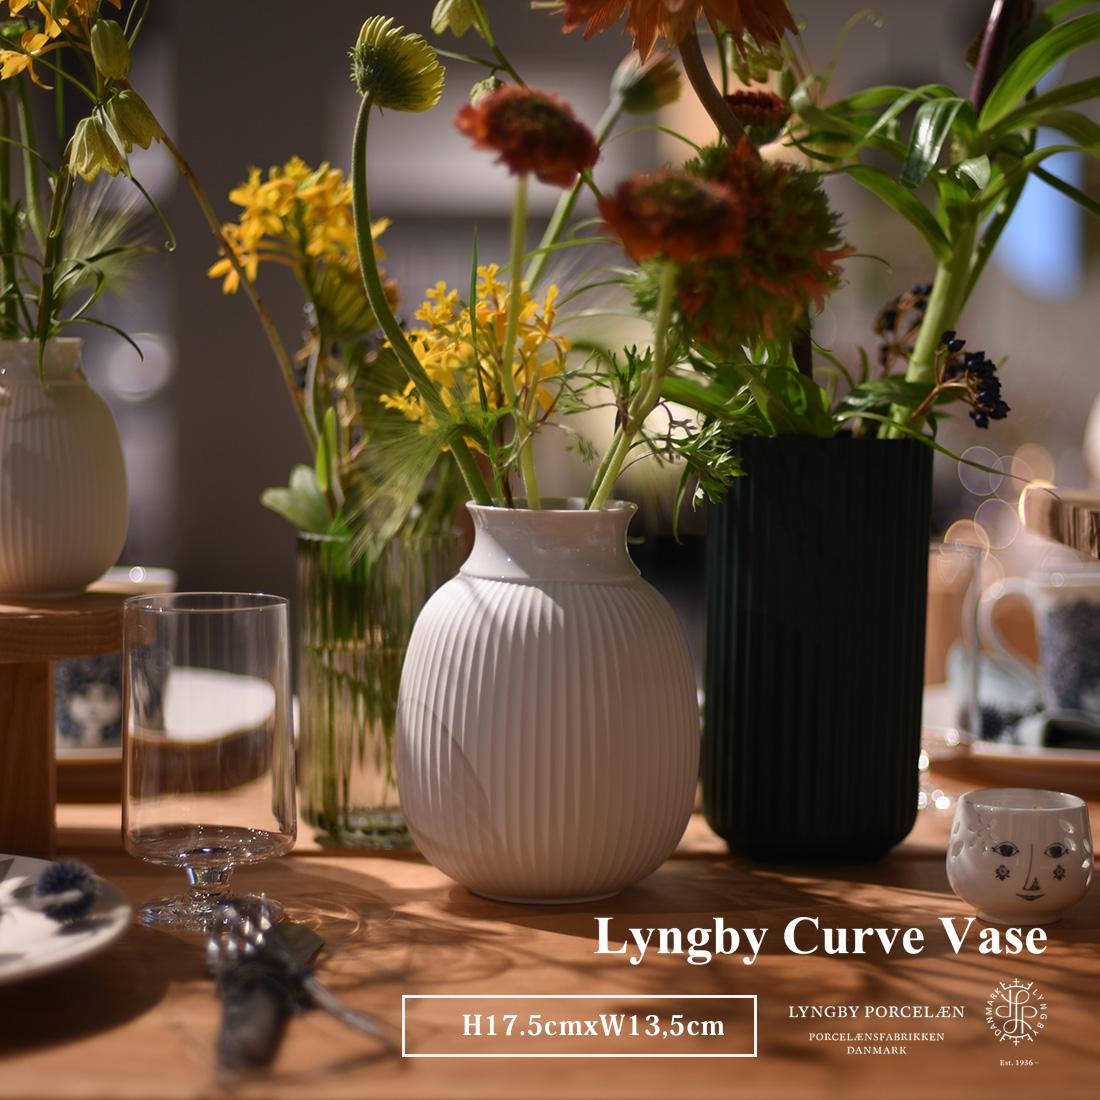 【Lyngby Porcelaen】Lyngby Curve Vase H17,5cm カーブベース リュンビュー ポーセリン 近代アート シンプル ローゼンダール デンマーク 花器 陶器 花瓶 北欧 200540 200541 ポルトガル  コンビニ受取対応